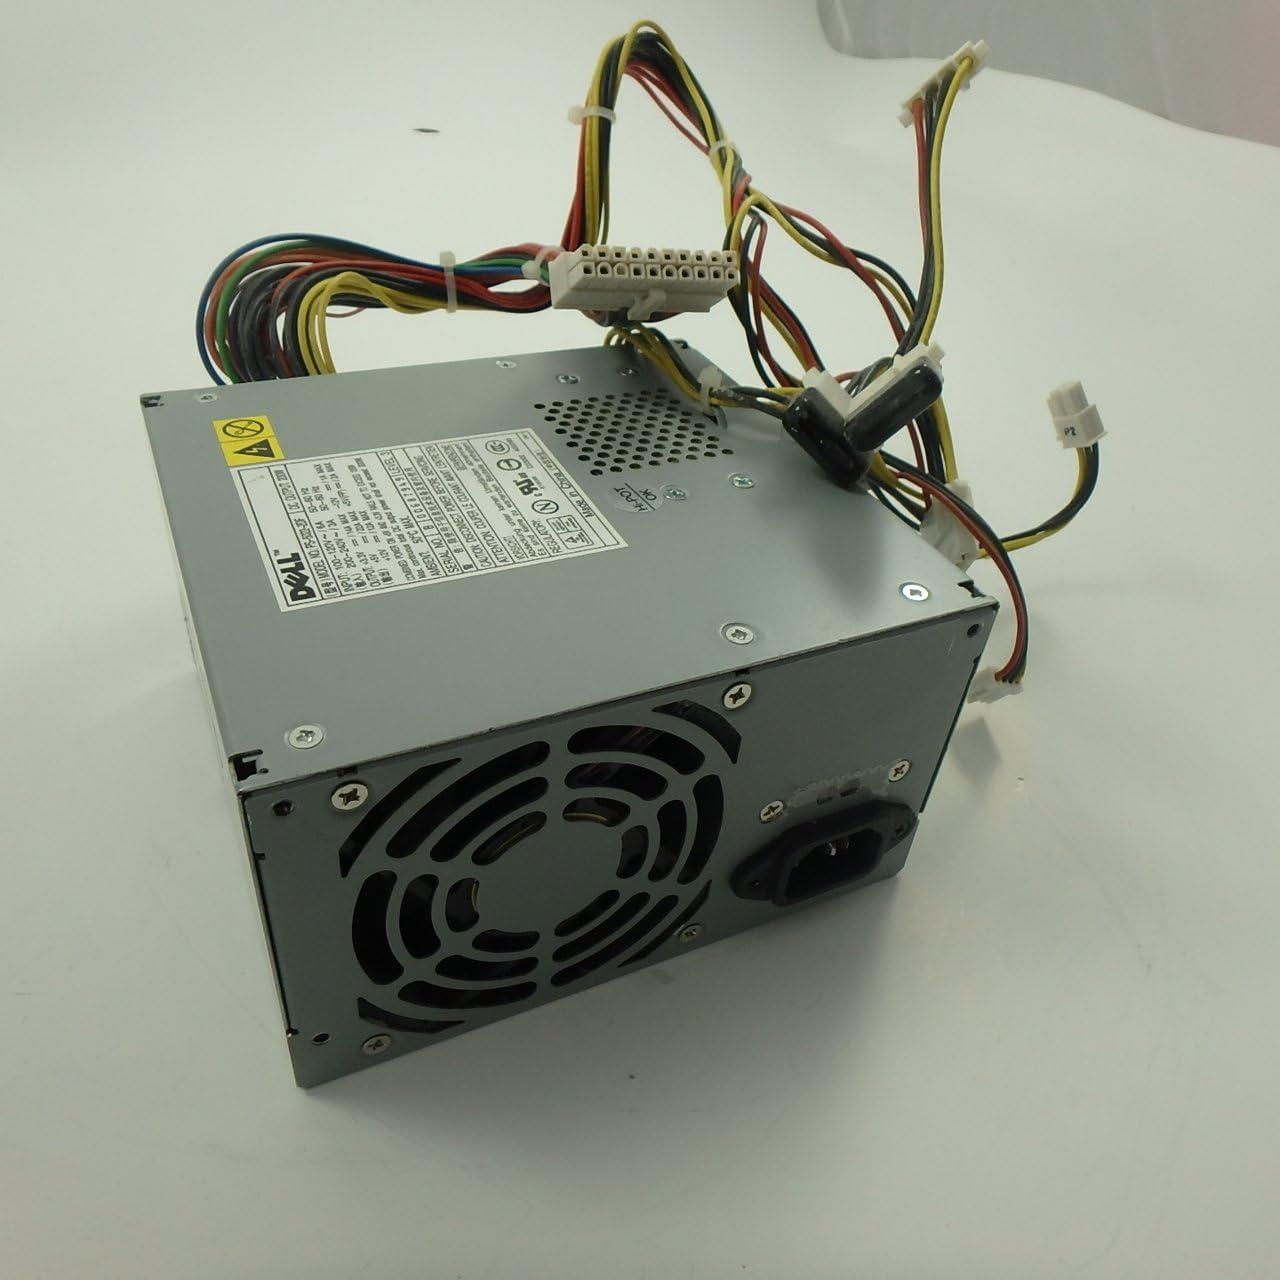 Dell - Cheap 200 Watt Superlatite Power Supply N0836 Dimension . 2400 for